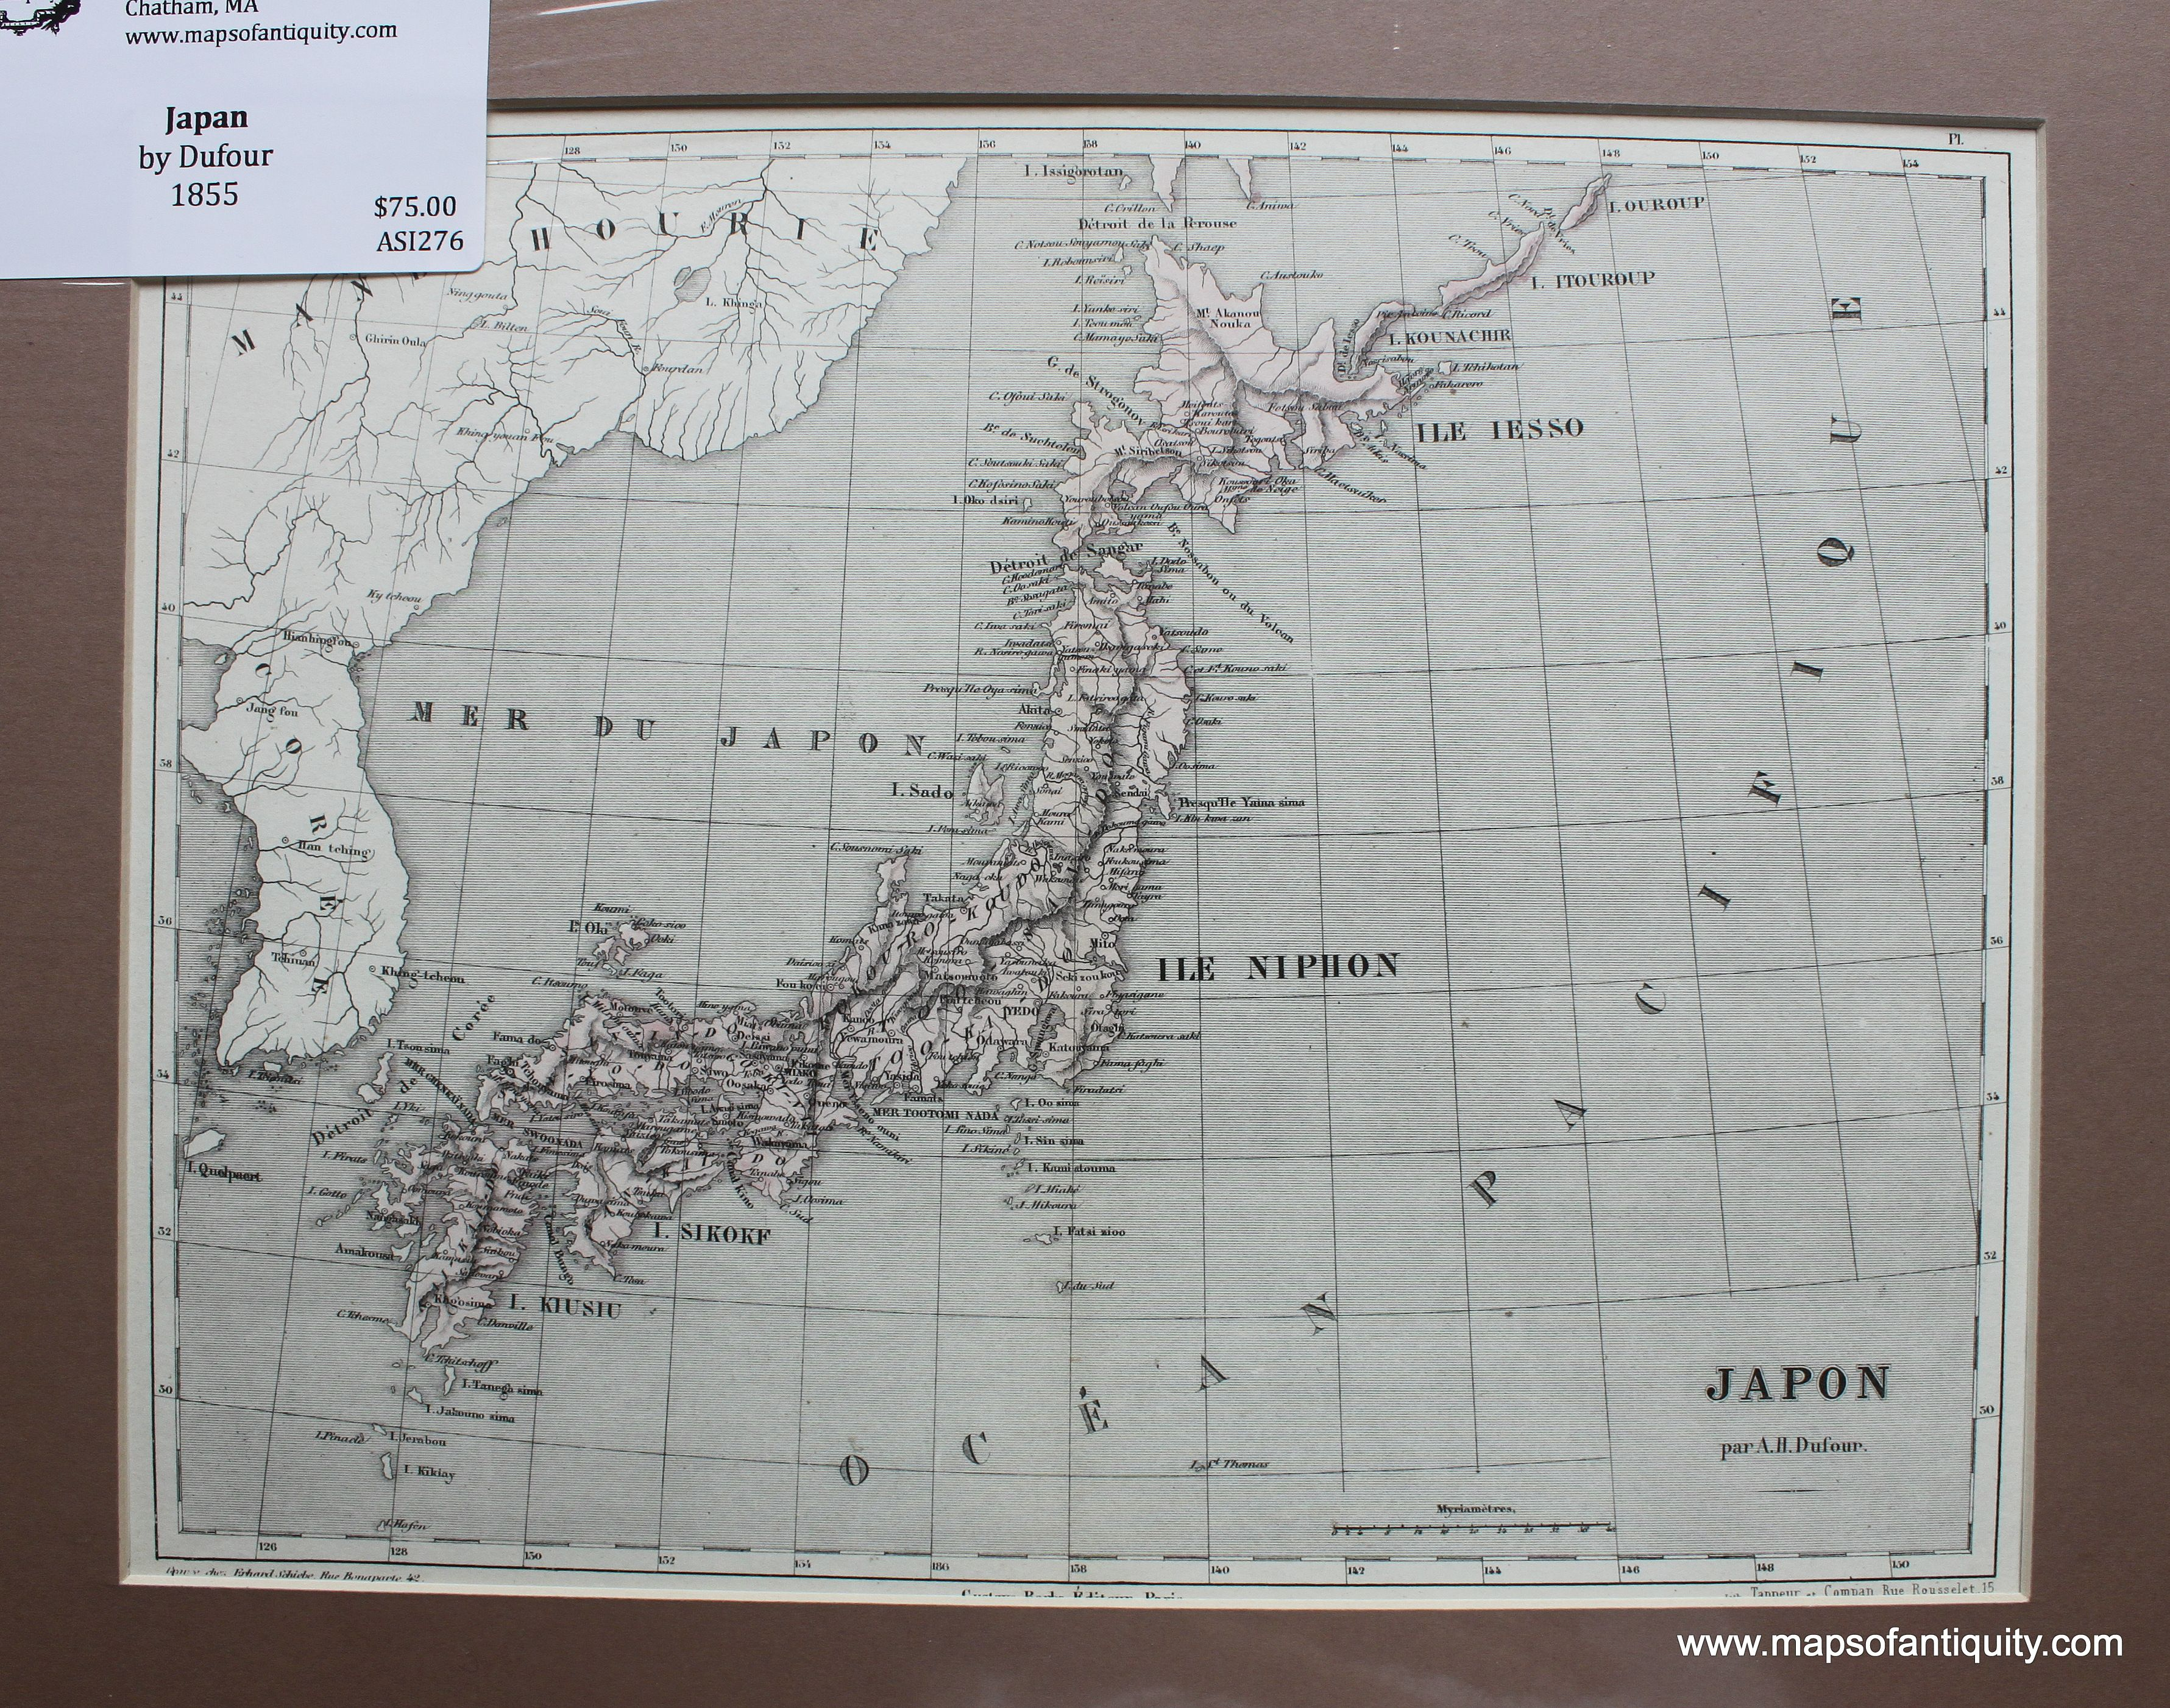 Japon japan antique maps and charts original vintage rare japon japan antique maps and charts original vintage rare historical publicscrutiny Image collections